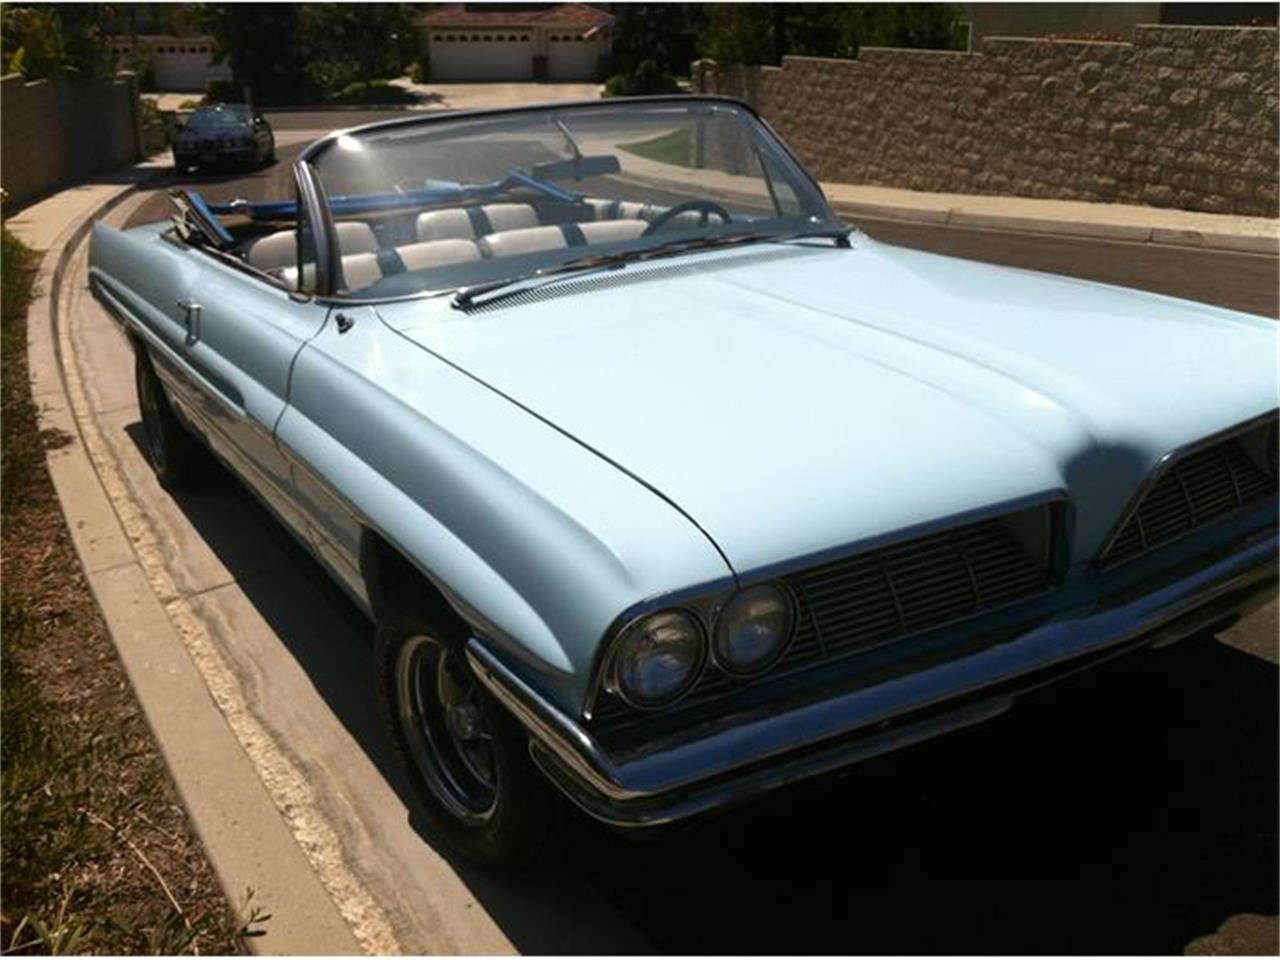 Large Picture of 1961 Bonneville located in Cot de Caza California - $18,995.00 - ASQZ